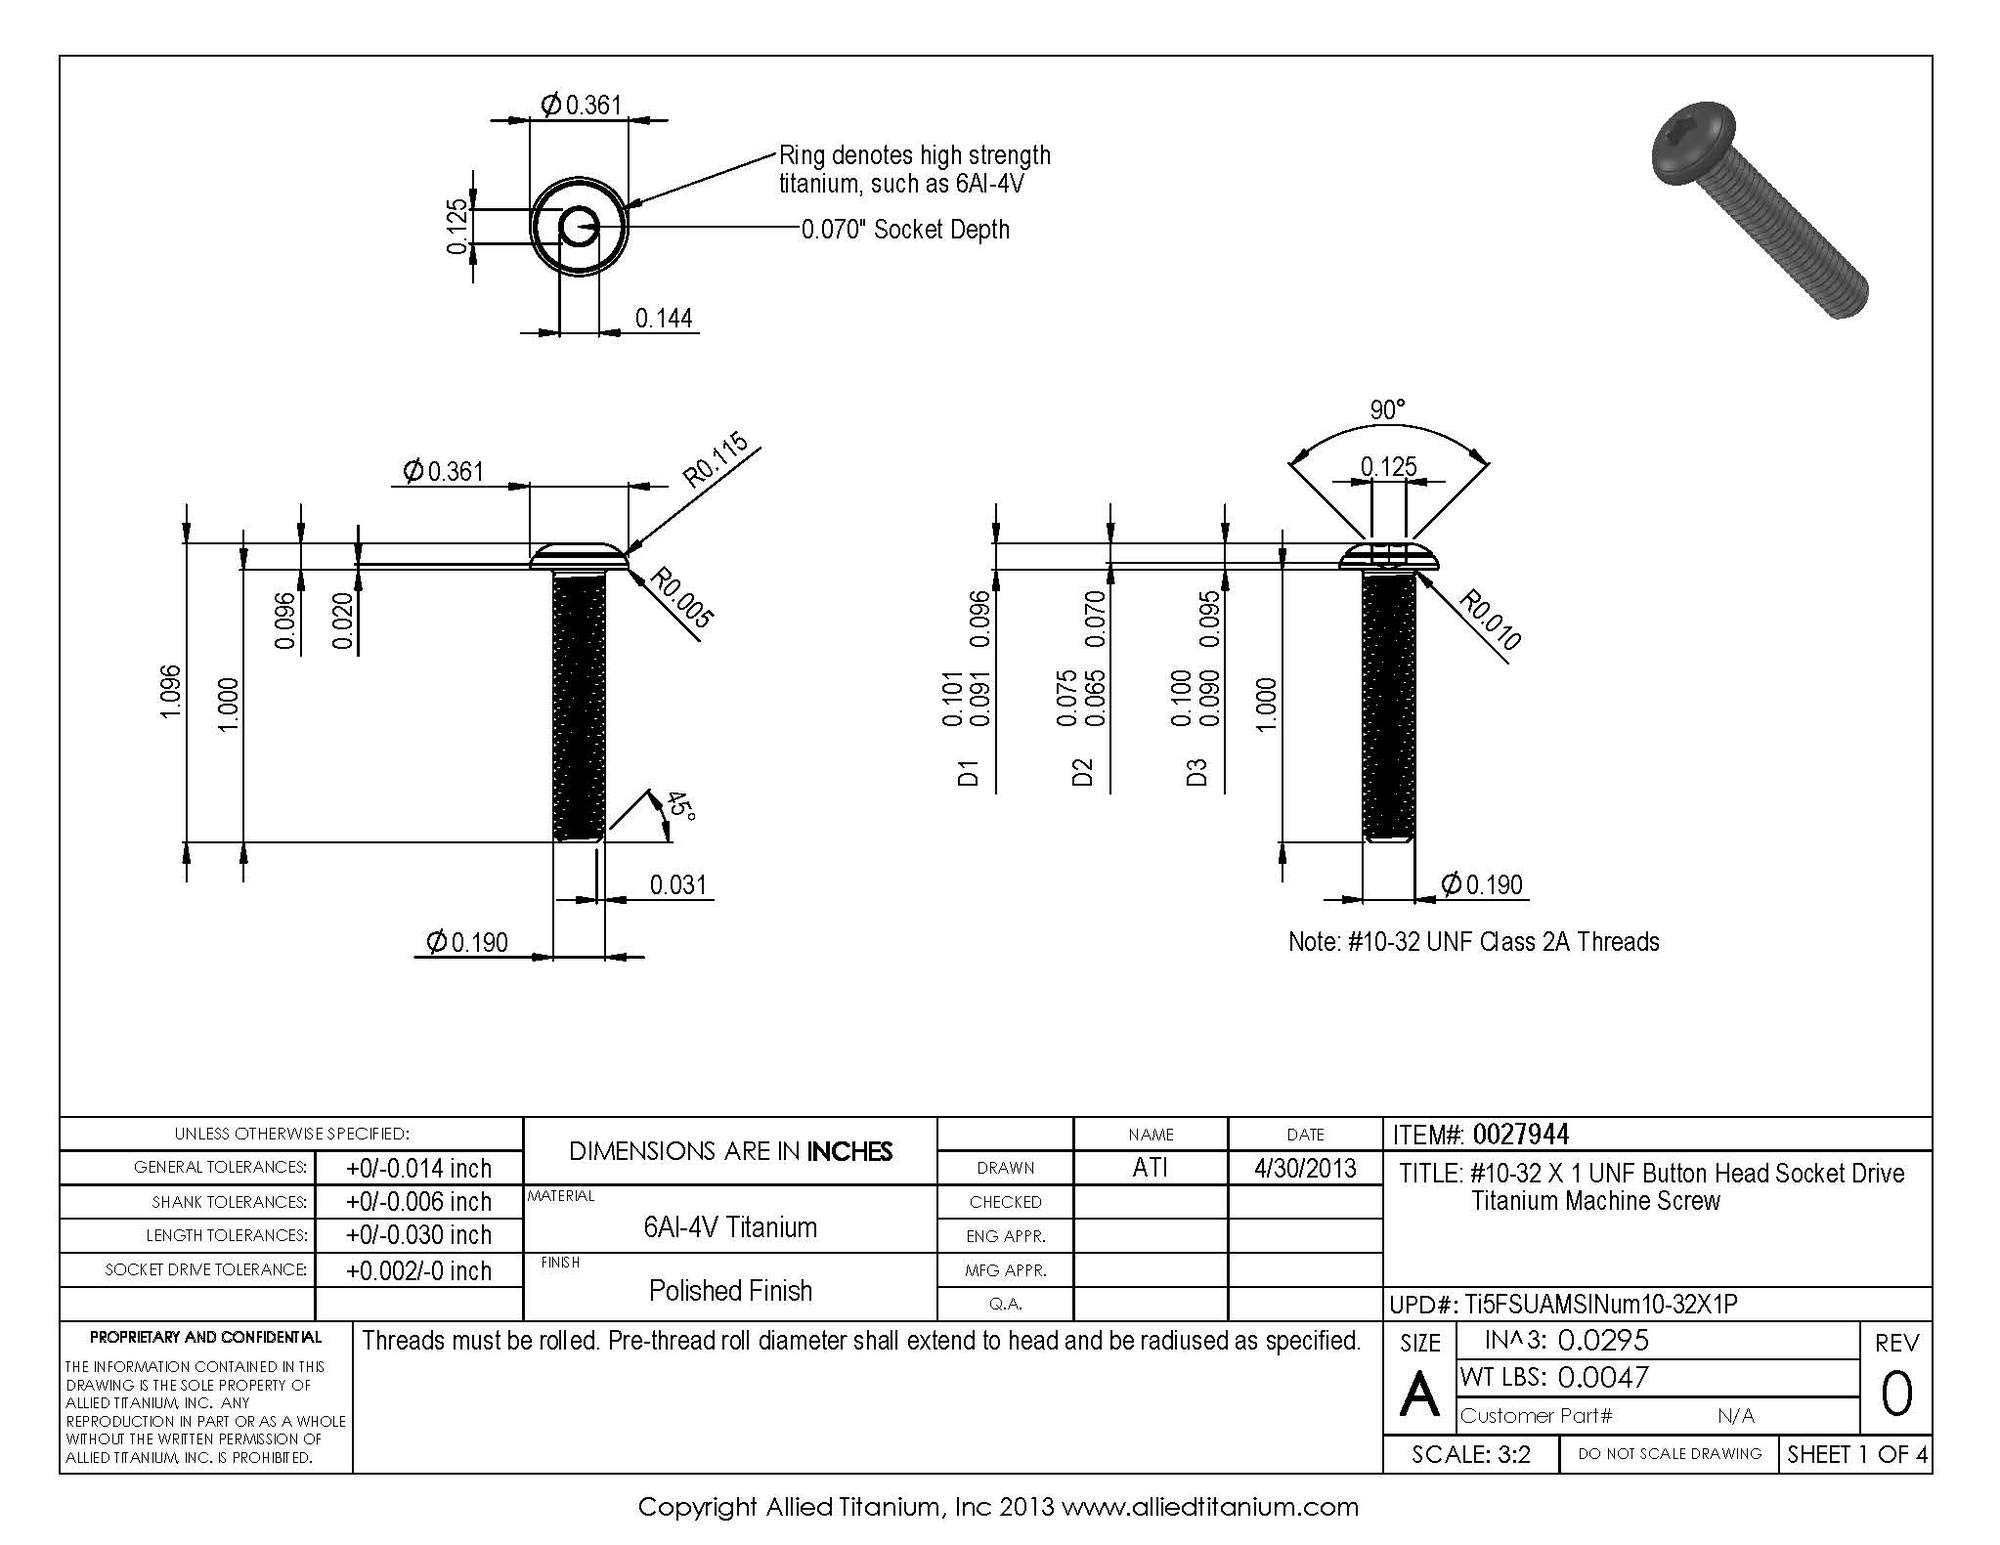 Allied Titanium 0027944, (Pack of 10) #10-32 X 1 UNF Button Head Socket Drive Machine Screw, Grade 5 (Ti-6Al-4V) by Allied Titanium (Image #2)